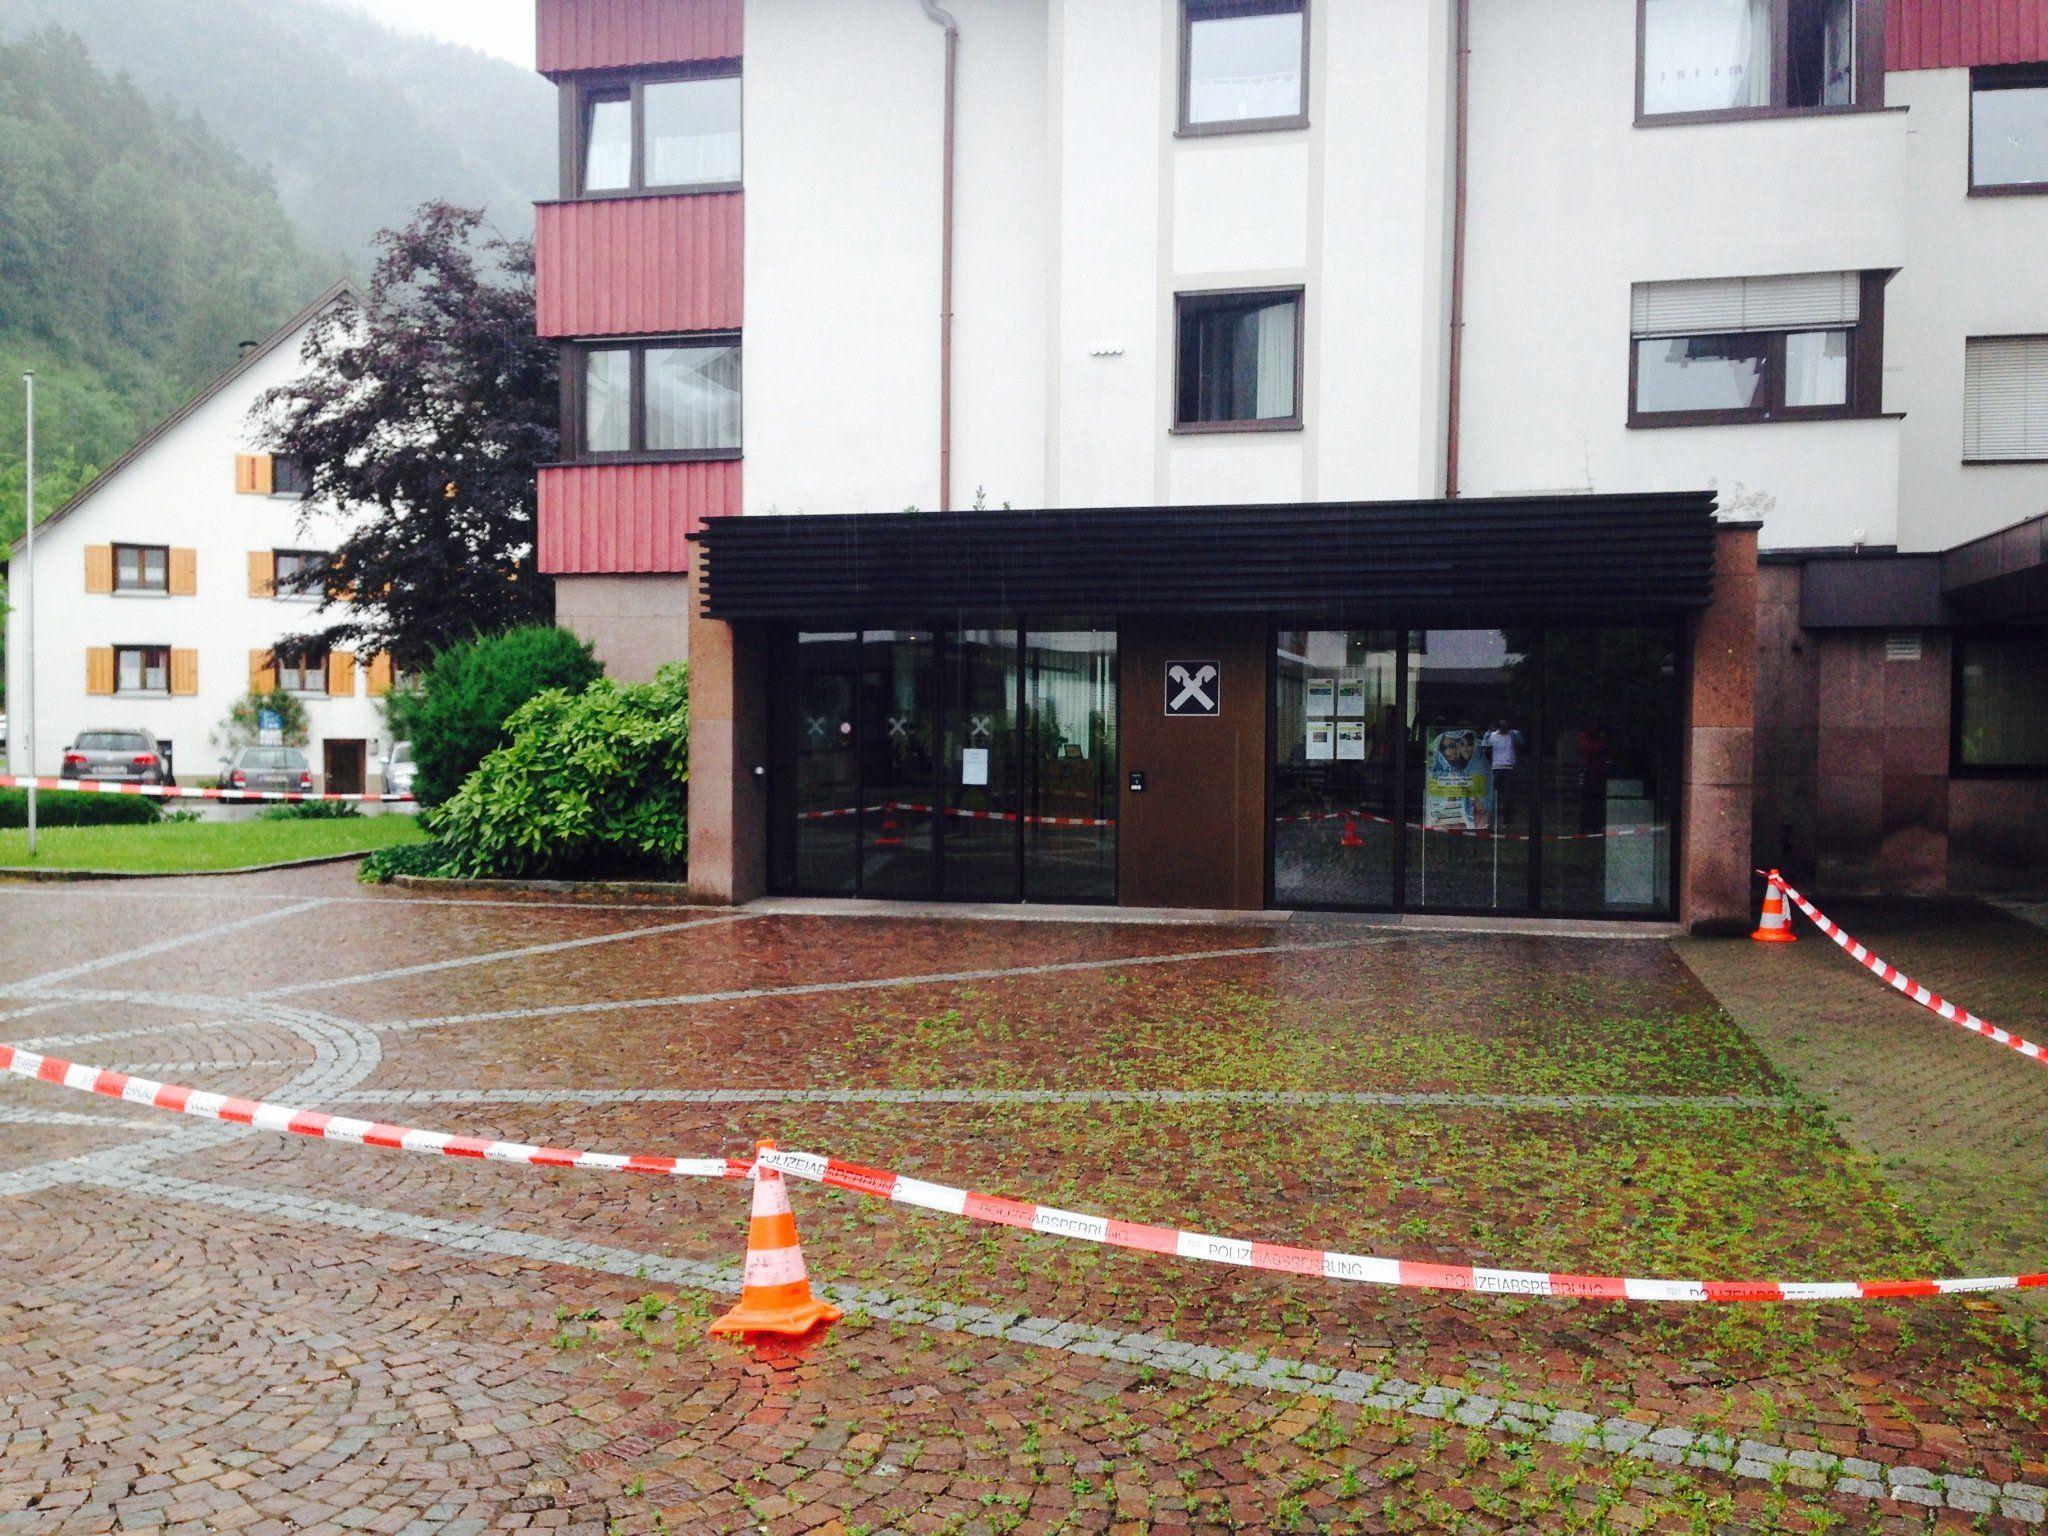 Landesweite Alarmfahndung in Vorarlberg nach Banküberfall in Nüziders